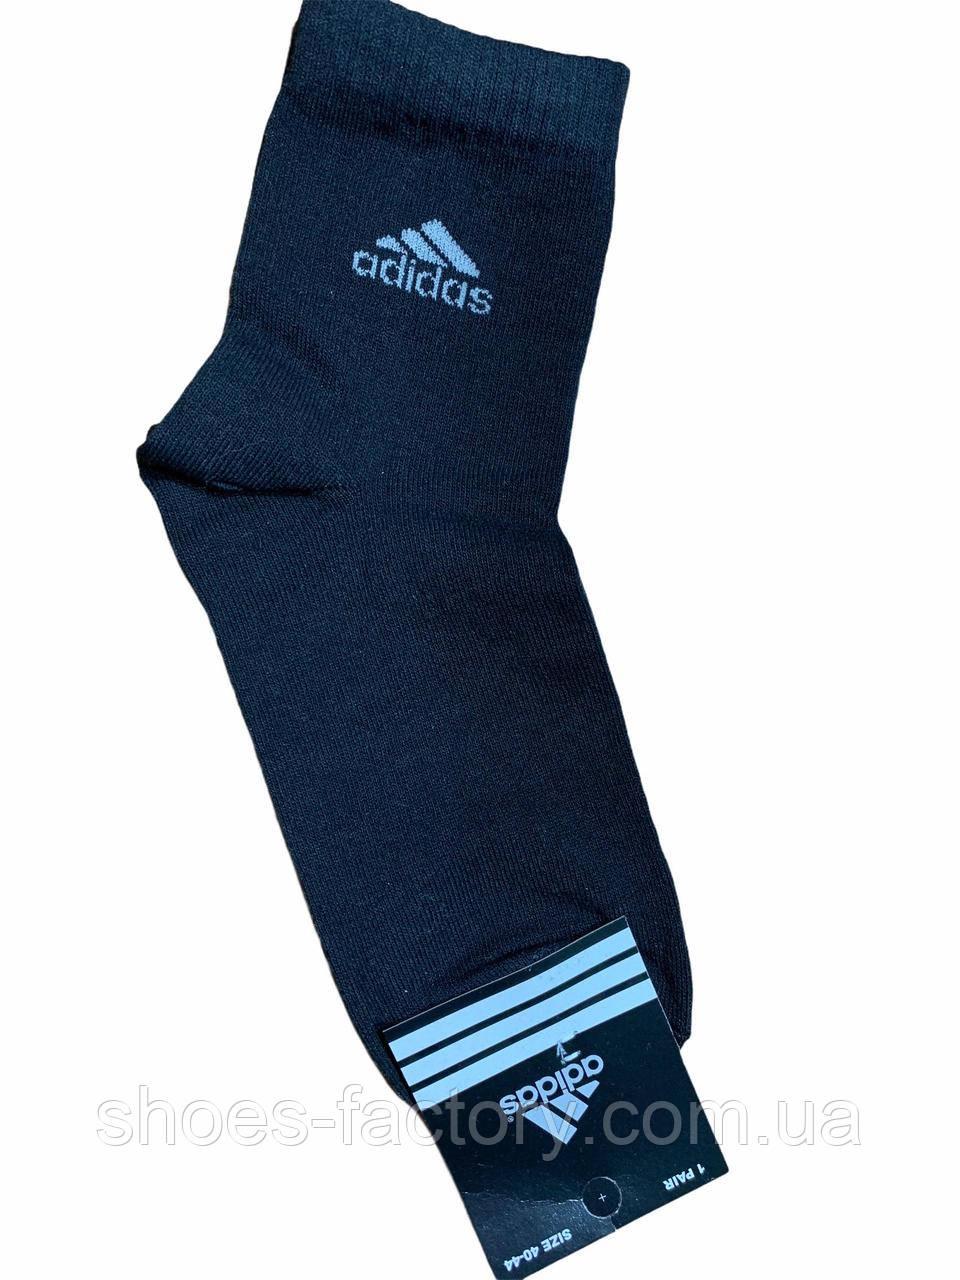 Мужские носки Adidas, Black